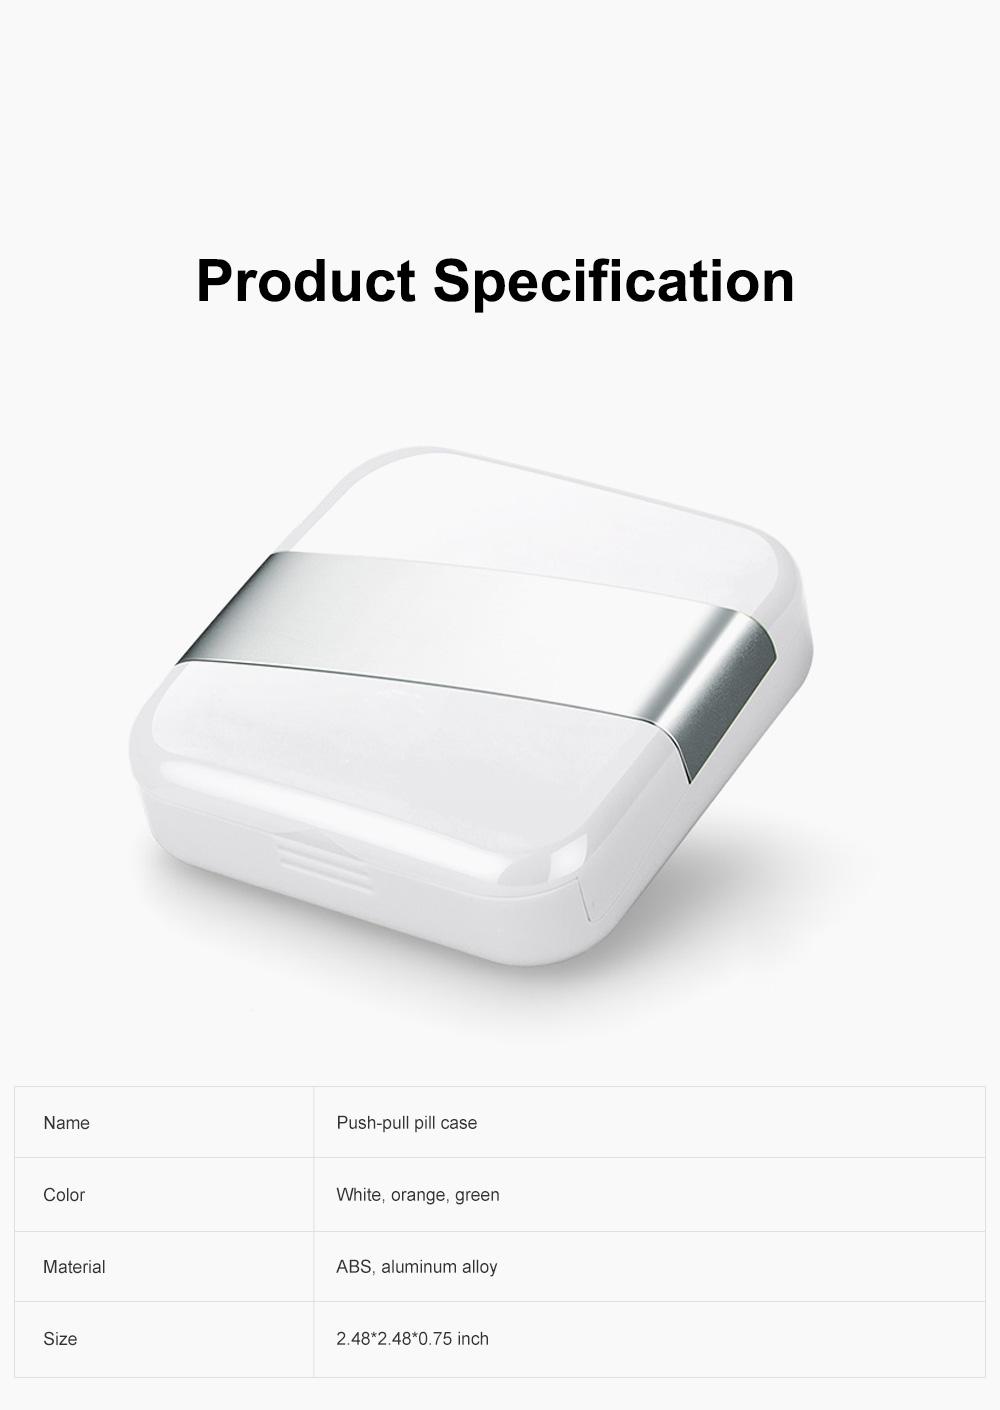 Minimalist Portable Creative Push-pull Split Slots Food-grade ABS Little Pill Case Jewelry Chewing Gum Storage Box 6